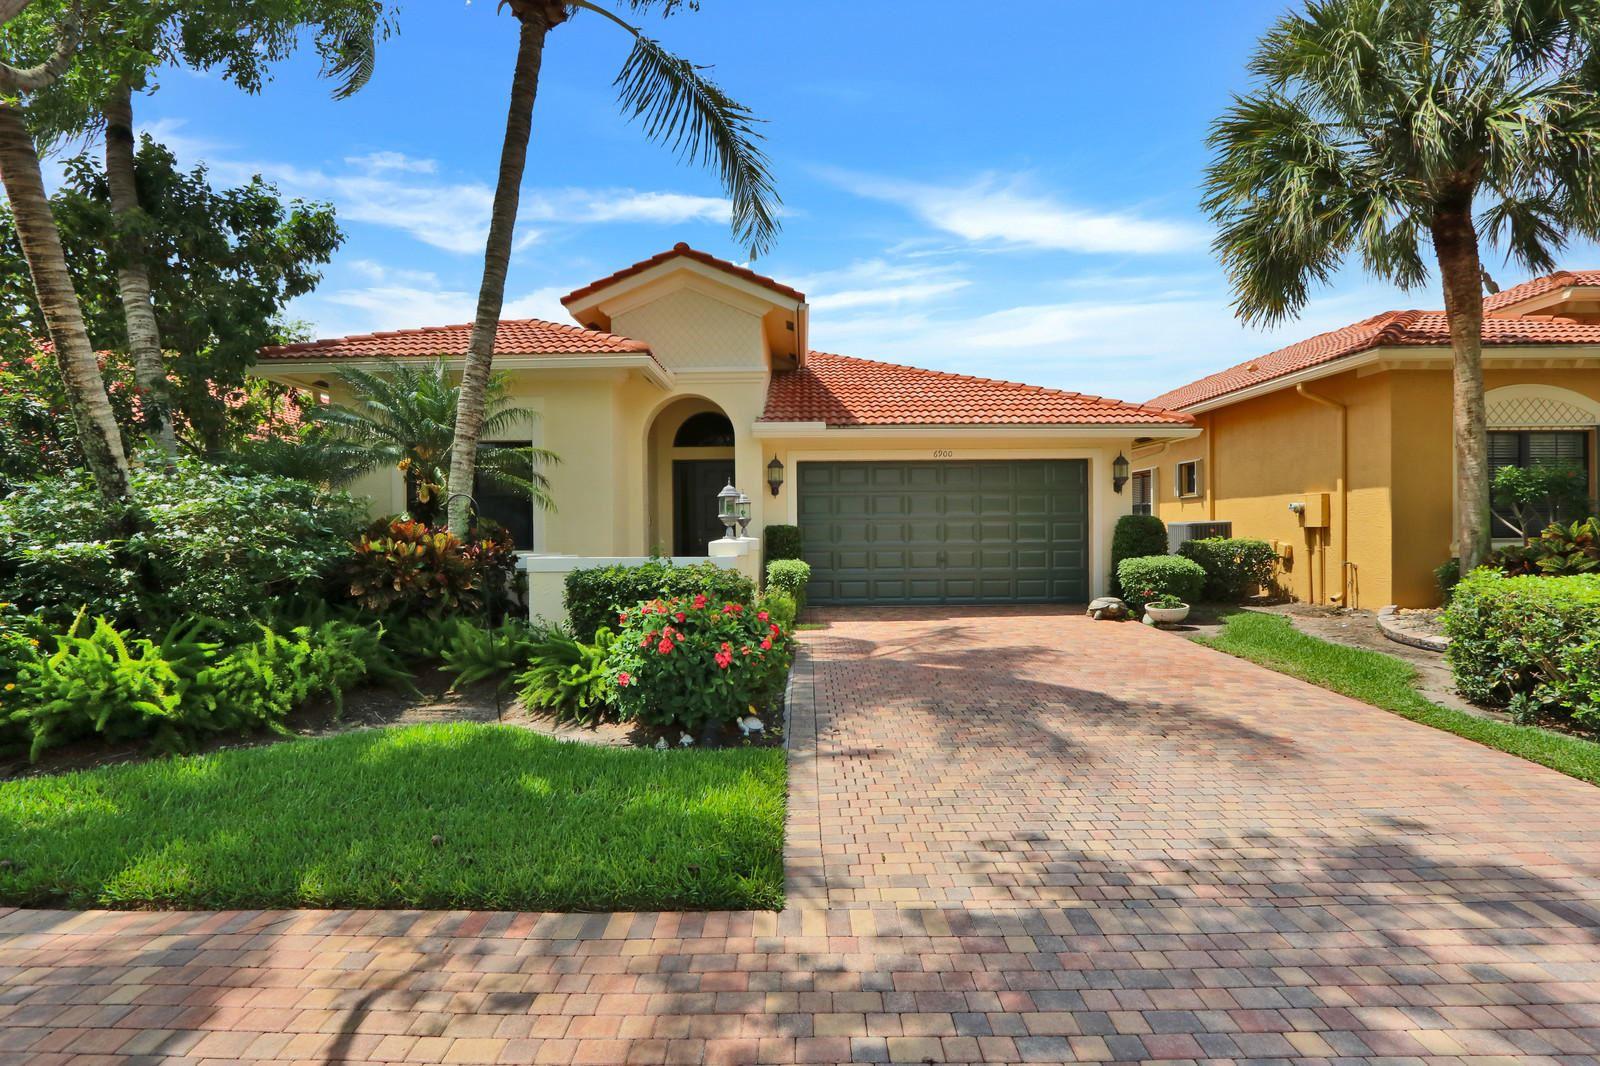 6900 Adriano Drive, Boynton Beach, FL 33437 - #: RX-10624359